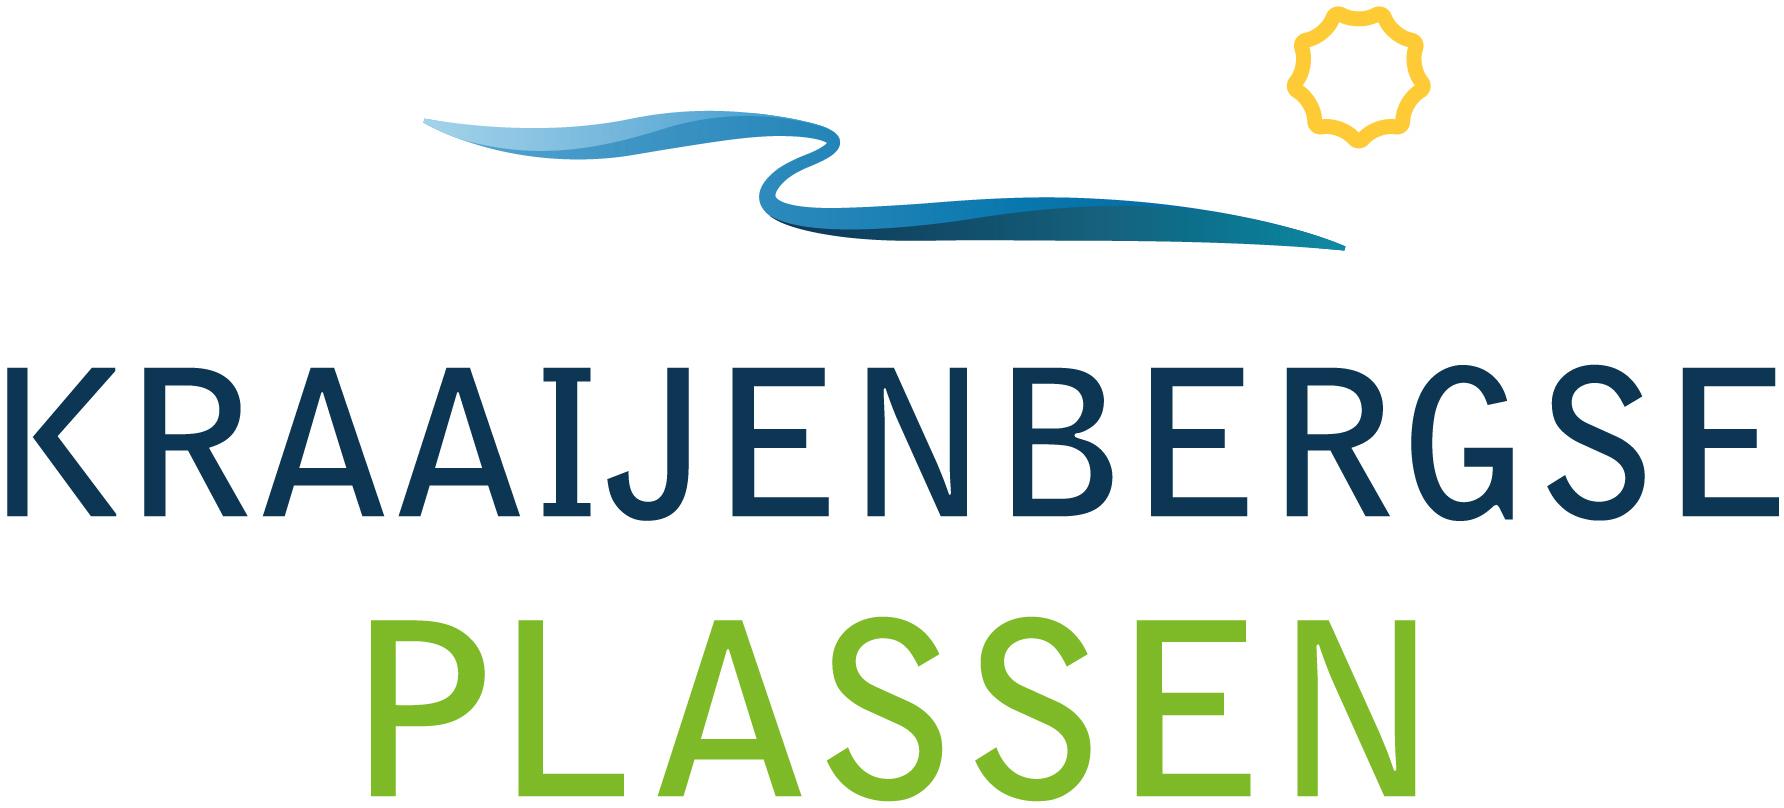 Kraaijenbergse Plassen logo